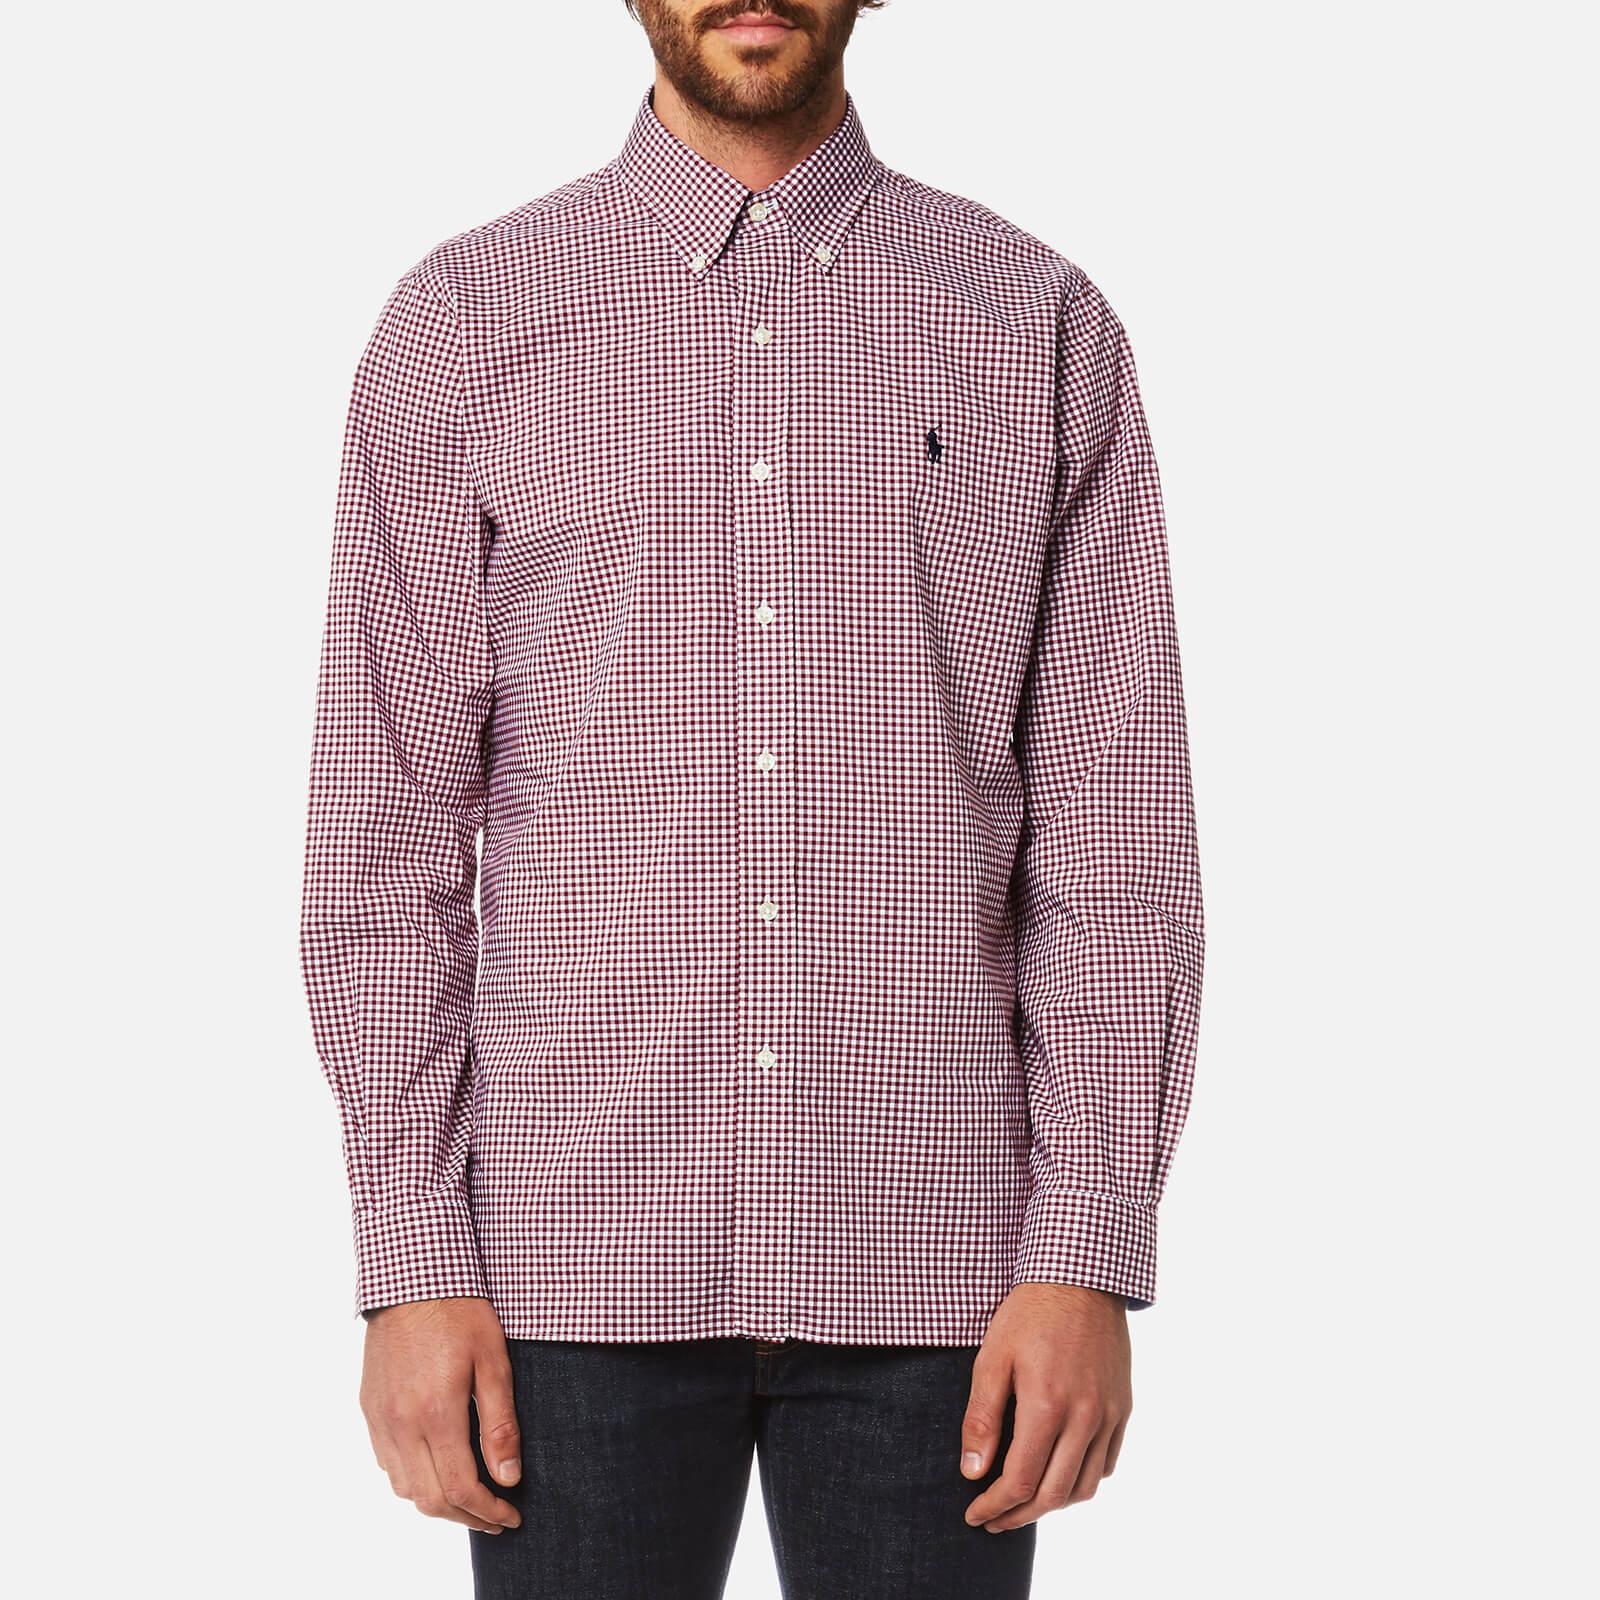 581289de7 Polo Ralph Lauren Men s Slim Fit Poplin Shirt - Red Check - Free UK  Delivery over £50